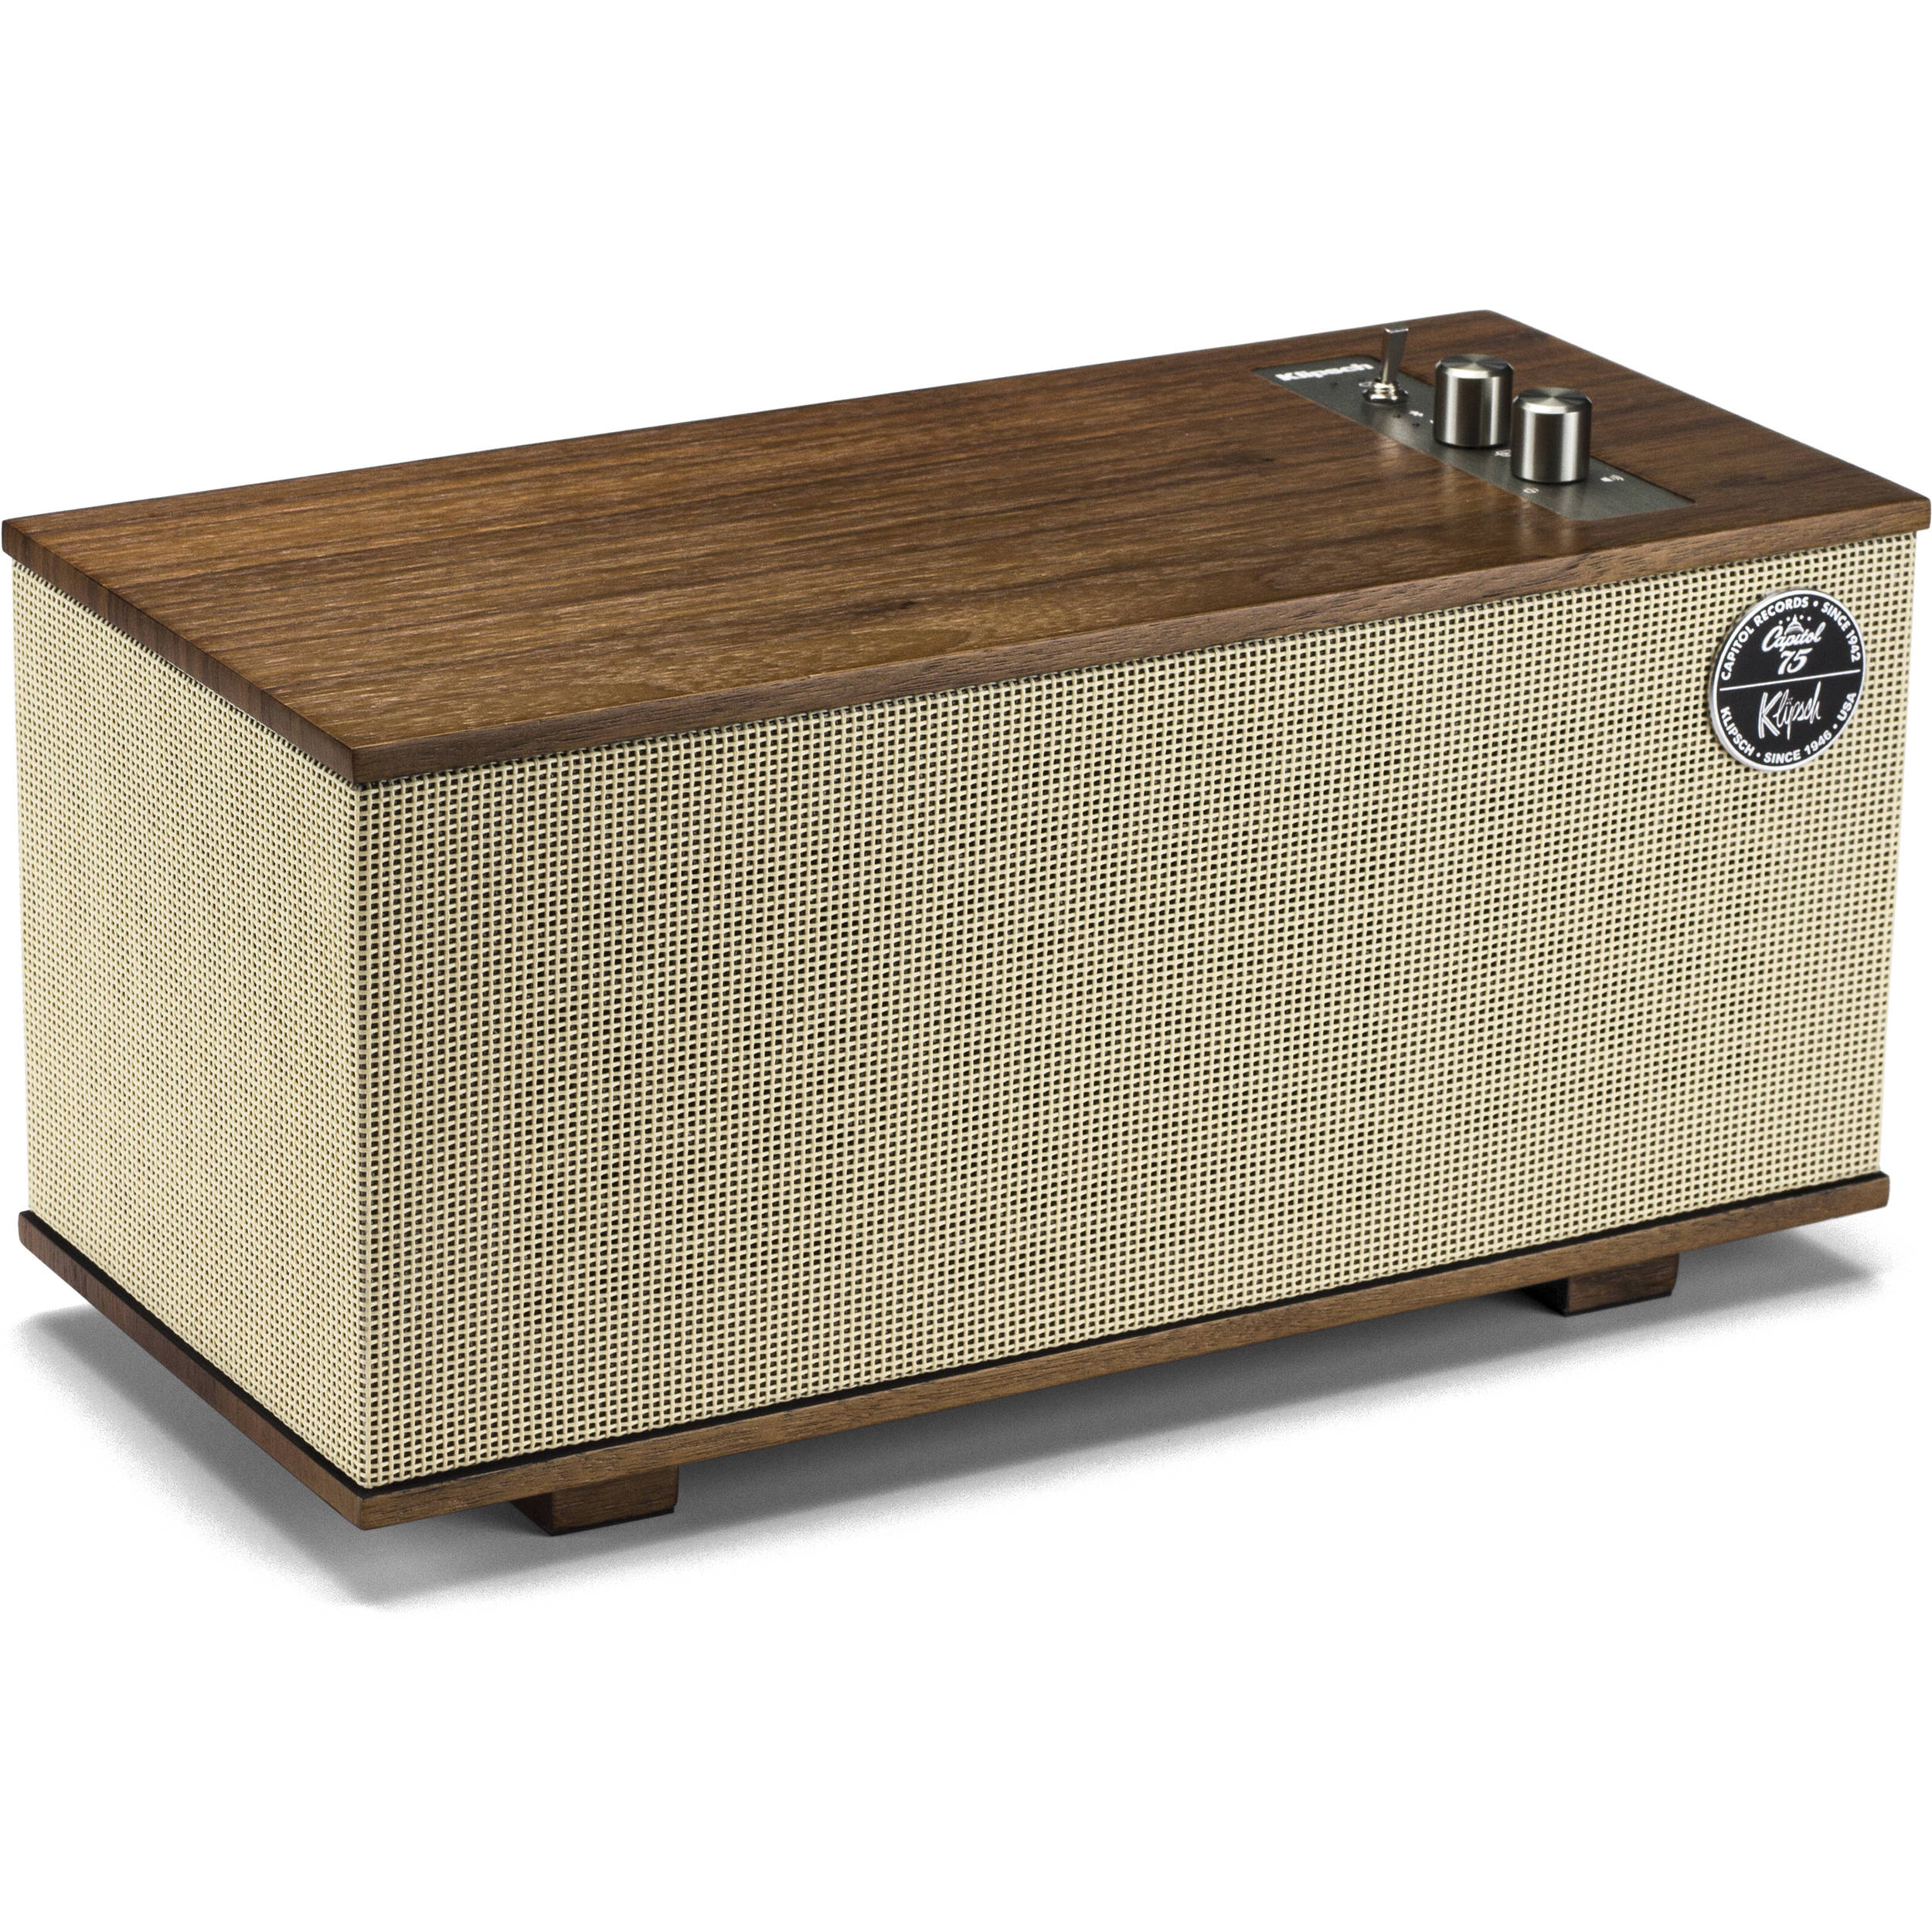 klipsch bluetooth speaker how to connect